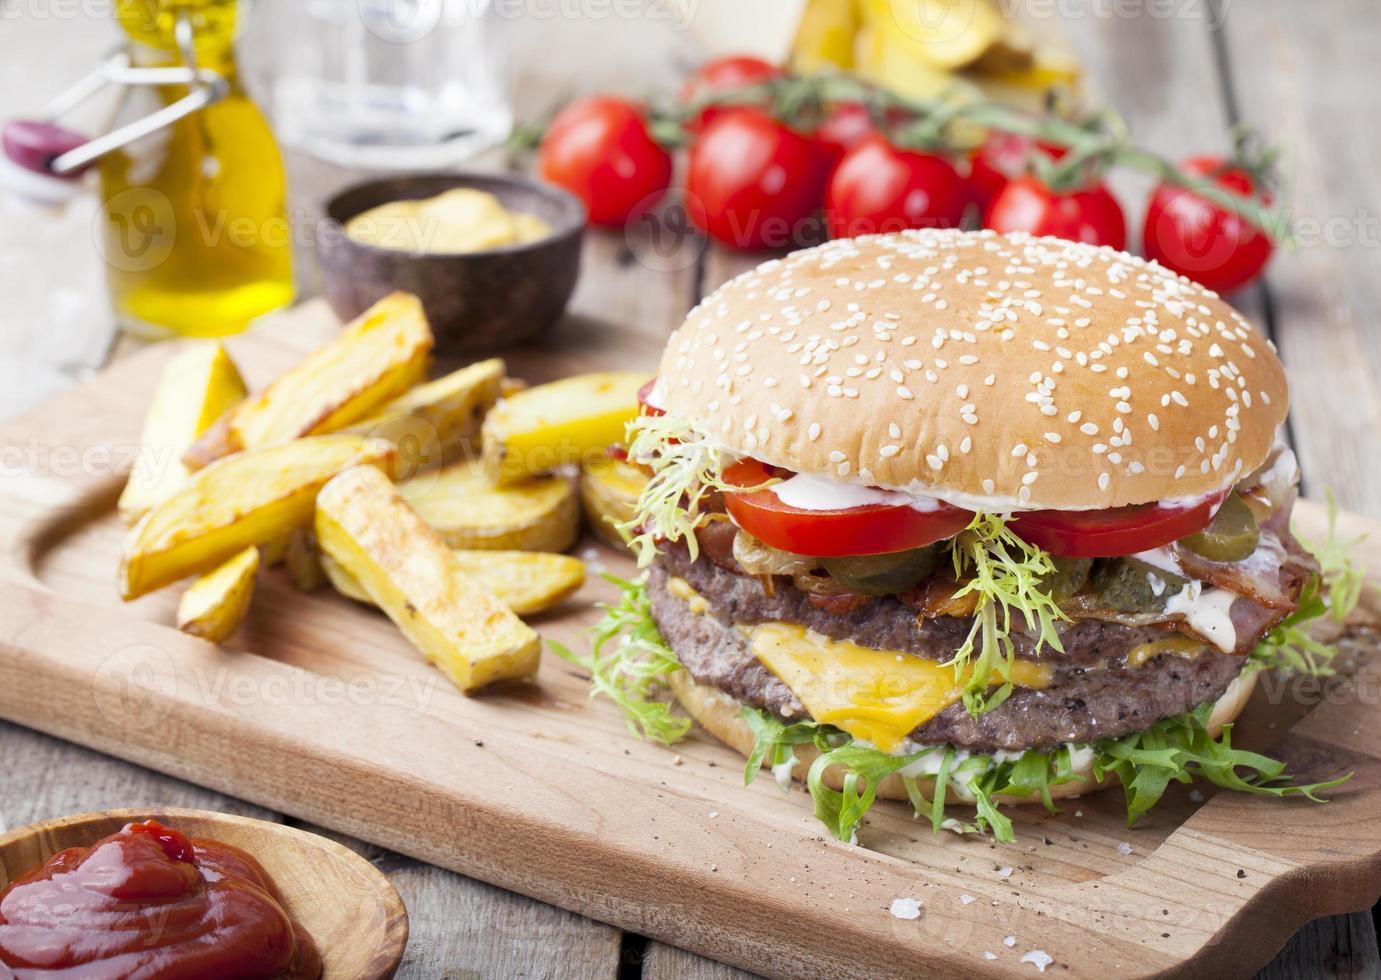 hamburger, hamburger con patatine fritte, ketchup, senape e verdure fresche foto